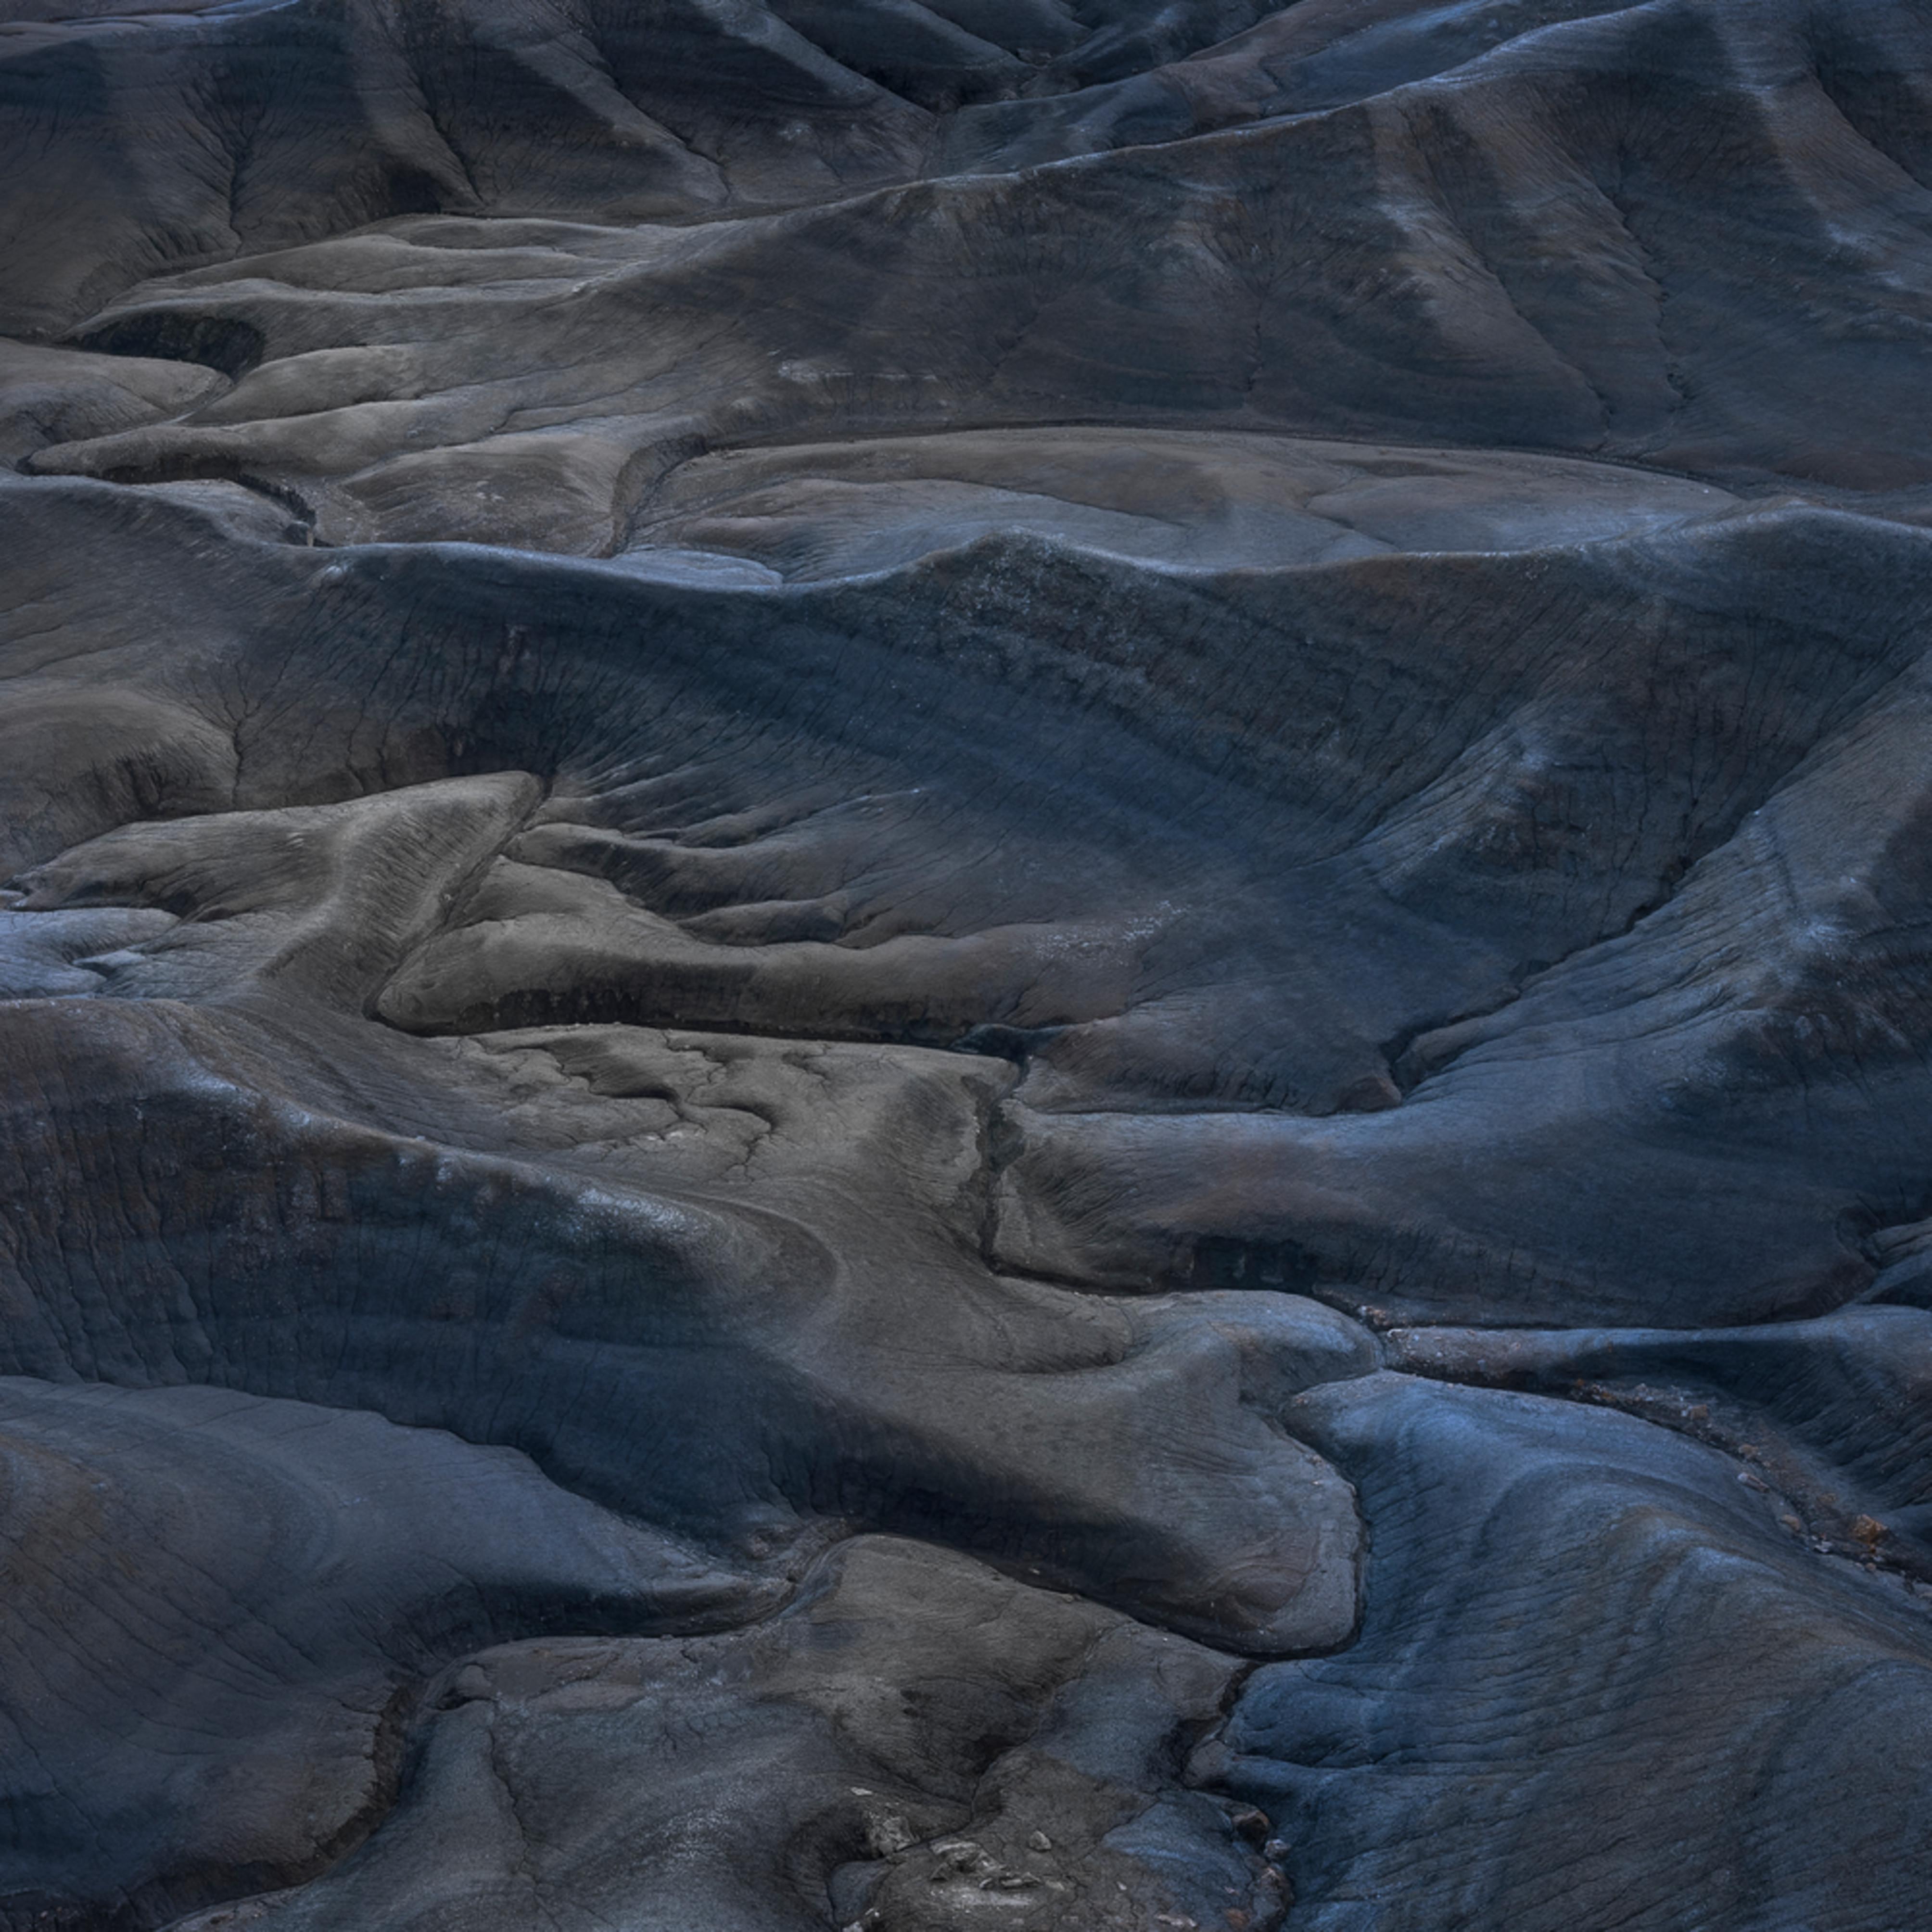 Flow cainsville badlands l0efzu